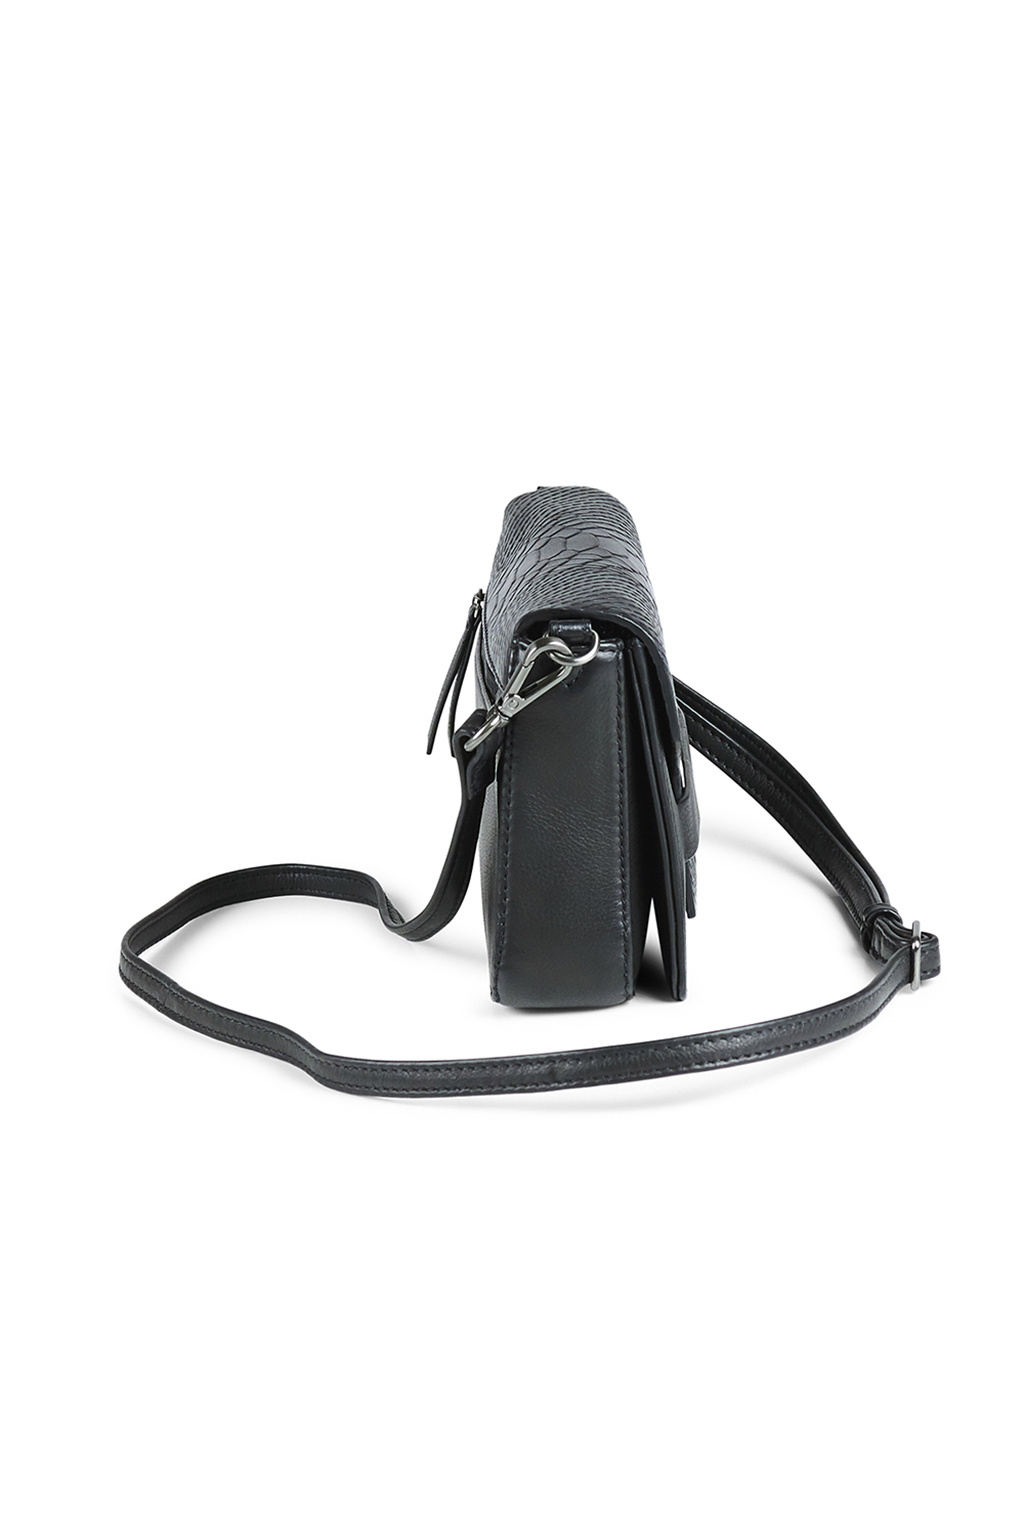 Vanya Crossbody Bag Snake - Black-3